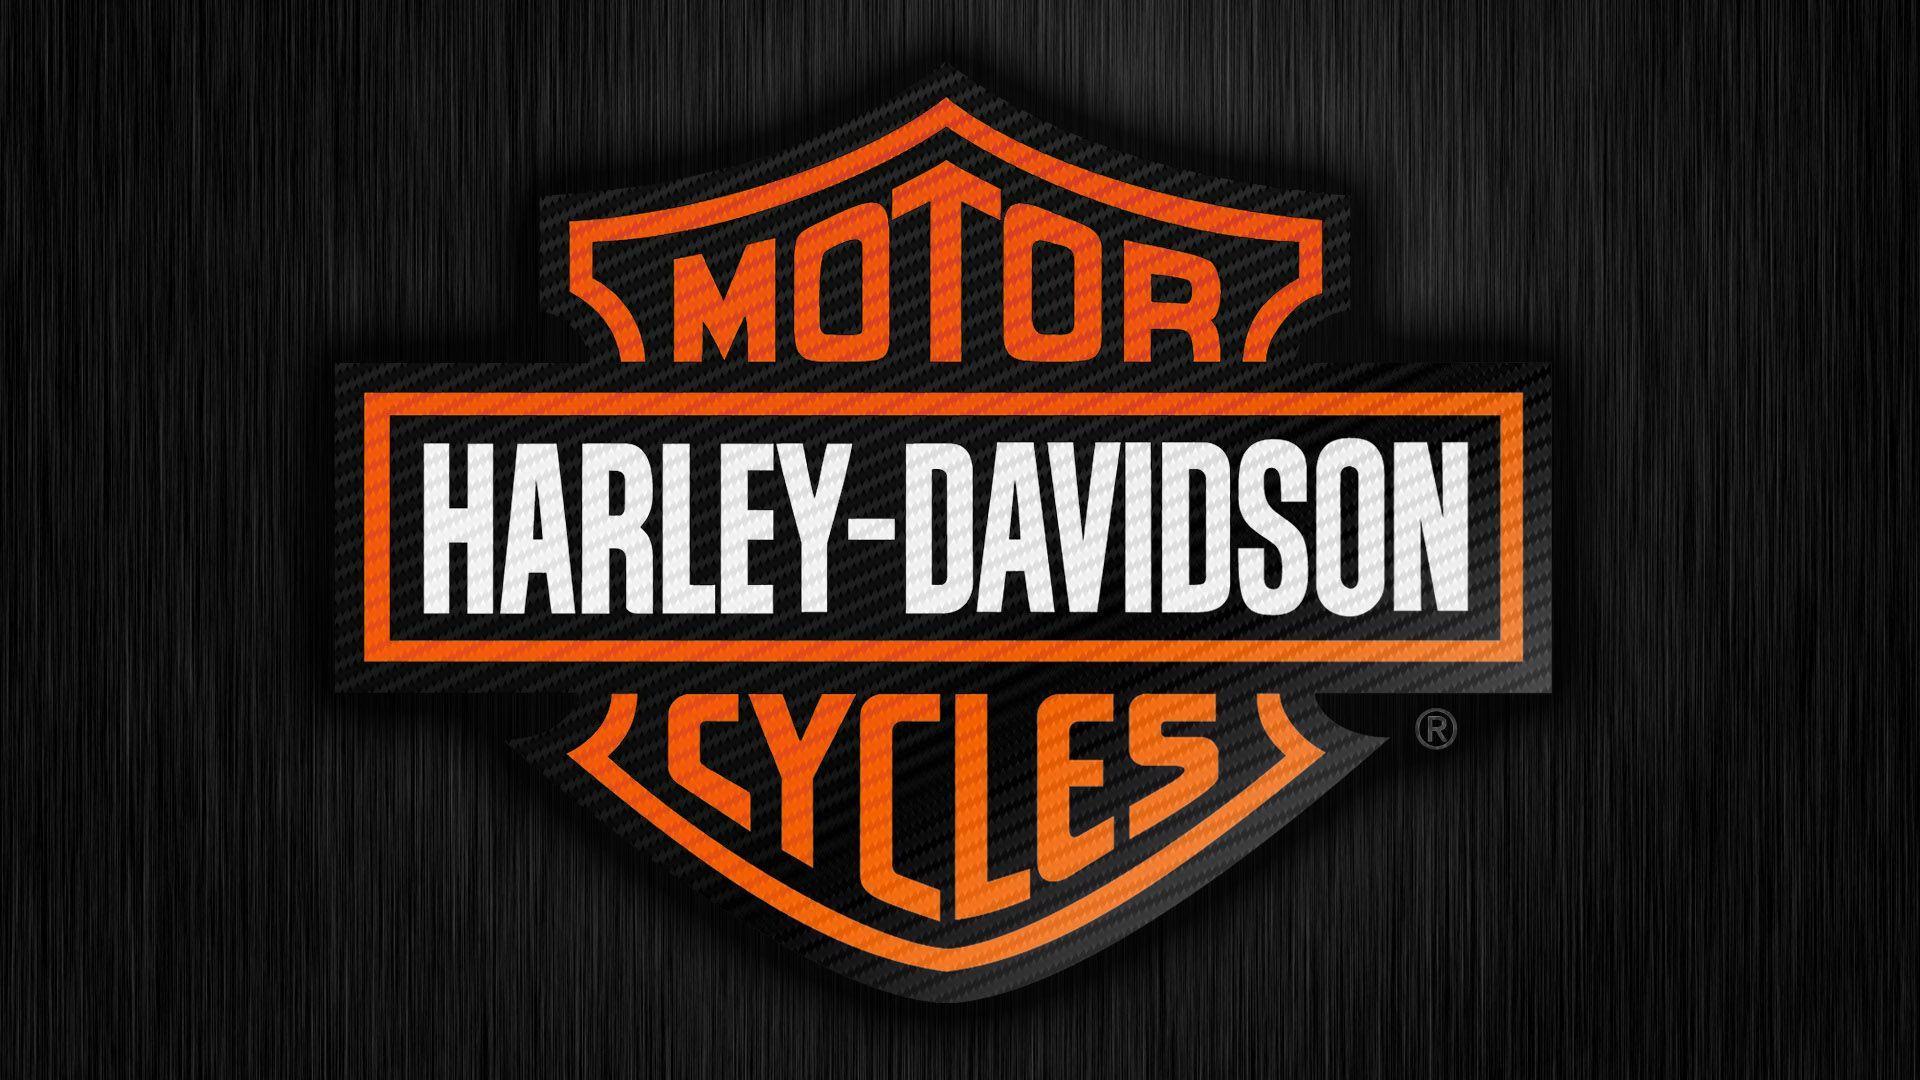 Harley Davidson Desktop Wallpapers Top Free Harley Davidson Desktop Backgrounds Wallpaperaccess